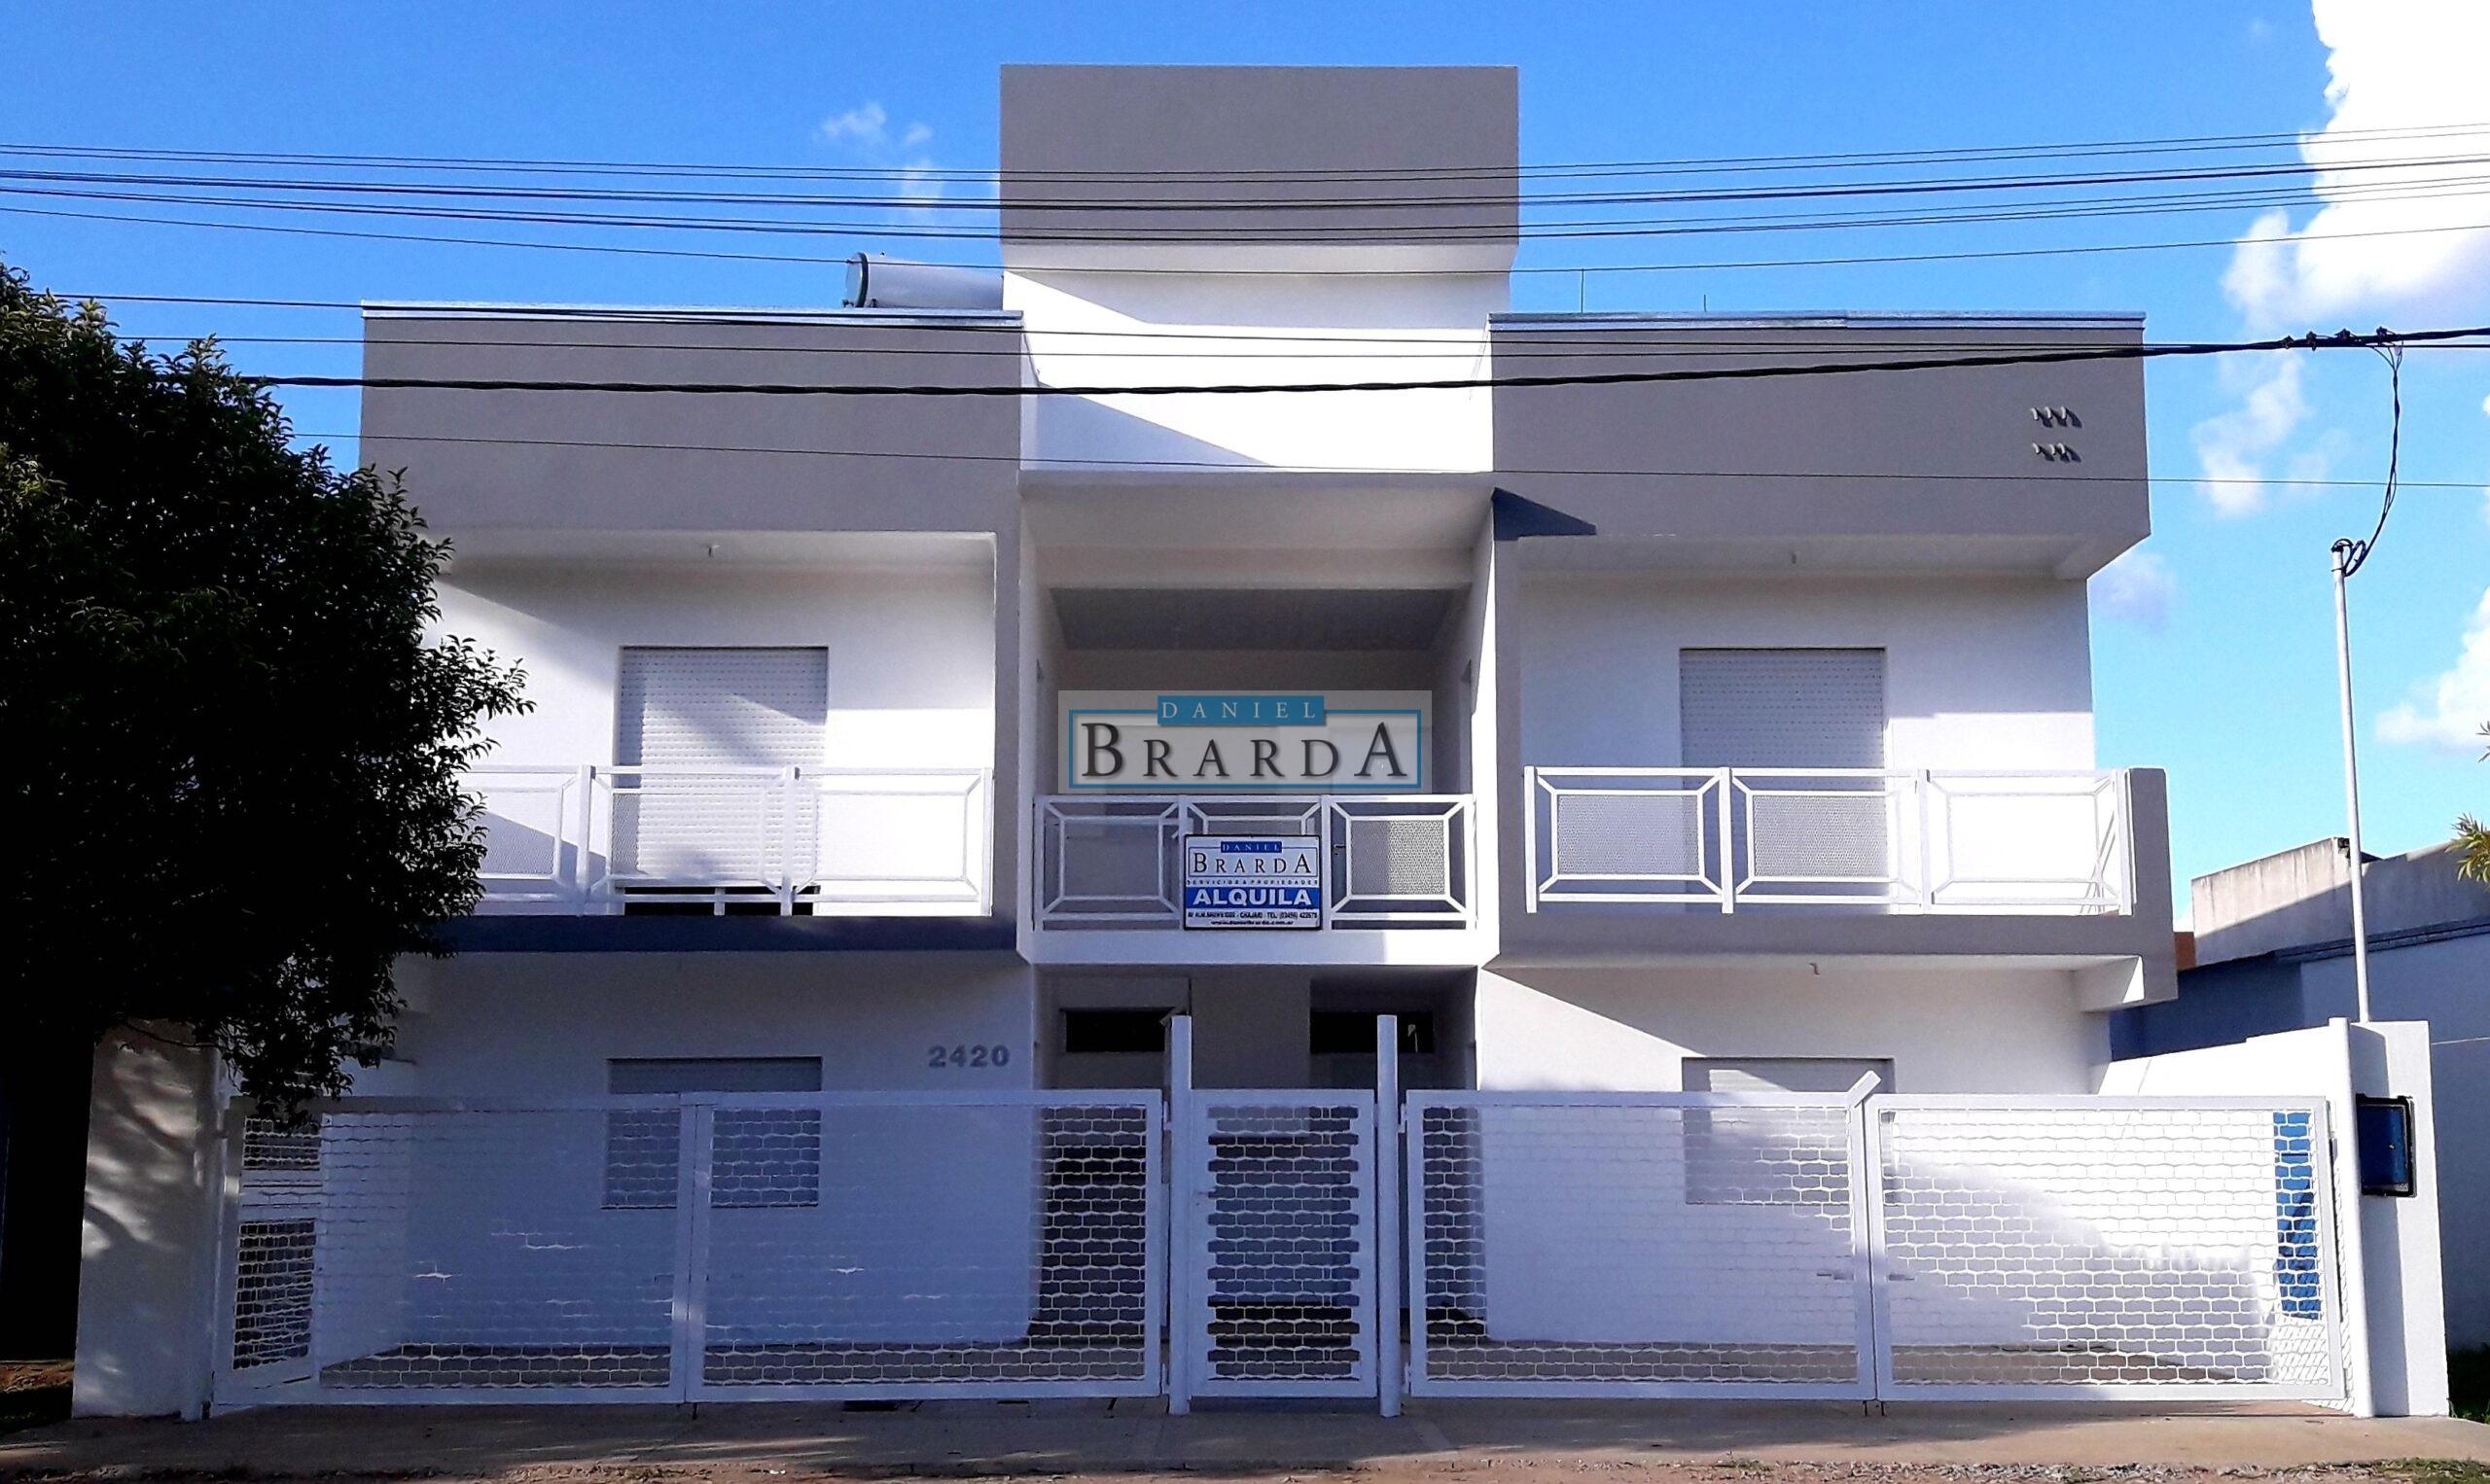 Departamento 1 (1 dormitorio) – Alte. Brown 2420 Chajari (ER)